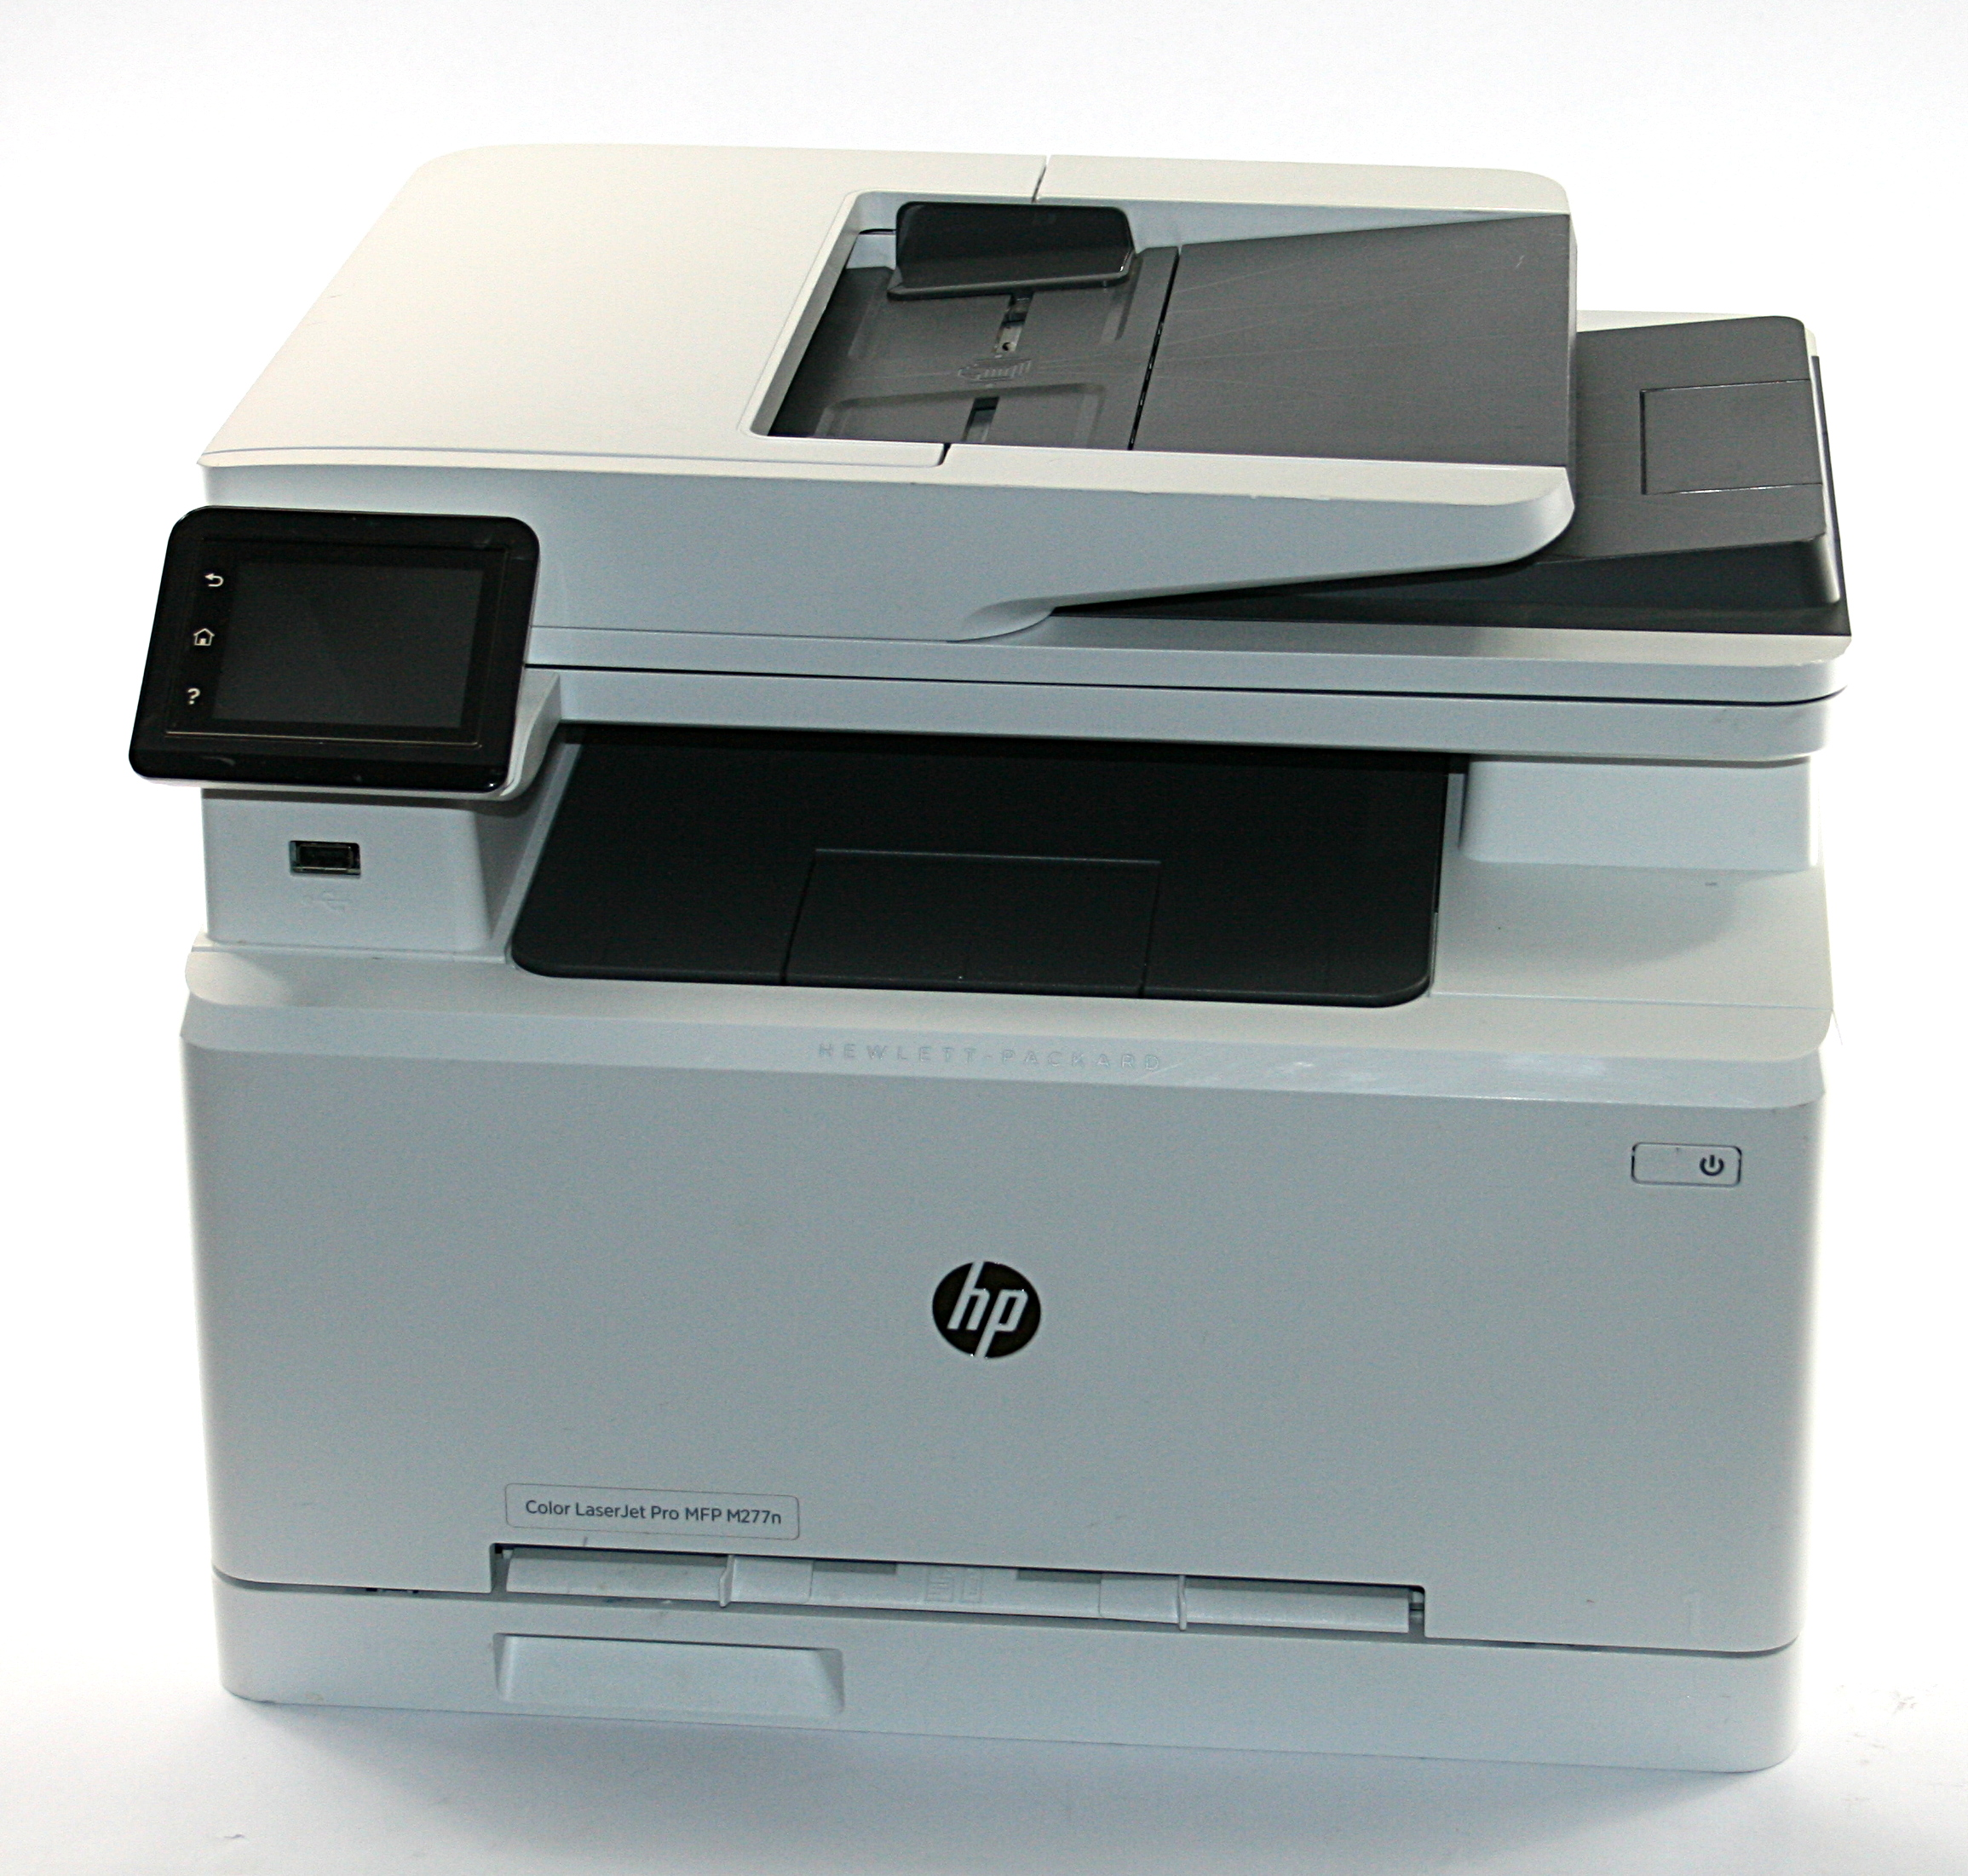 7448d398b6eb HP LaserJet Pro MFP M277n All In One Colour Laser Printer   Printers ...